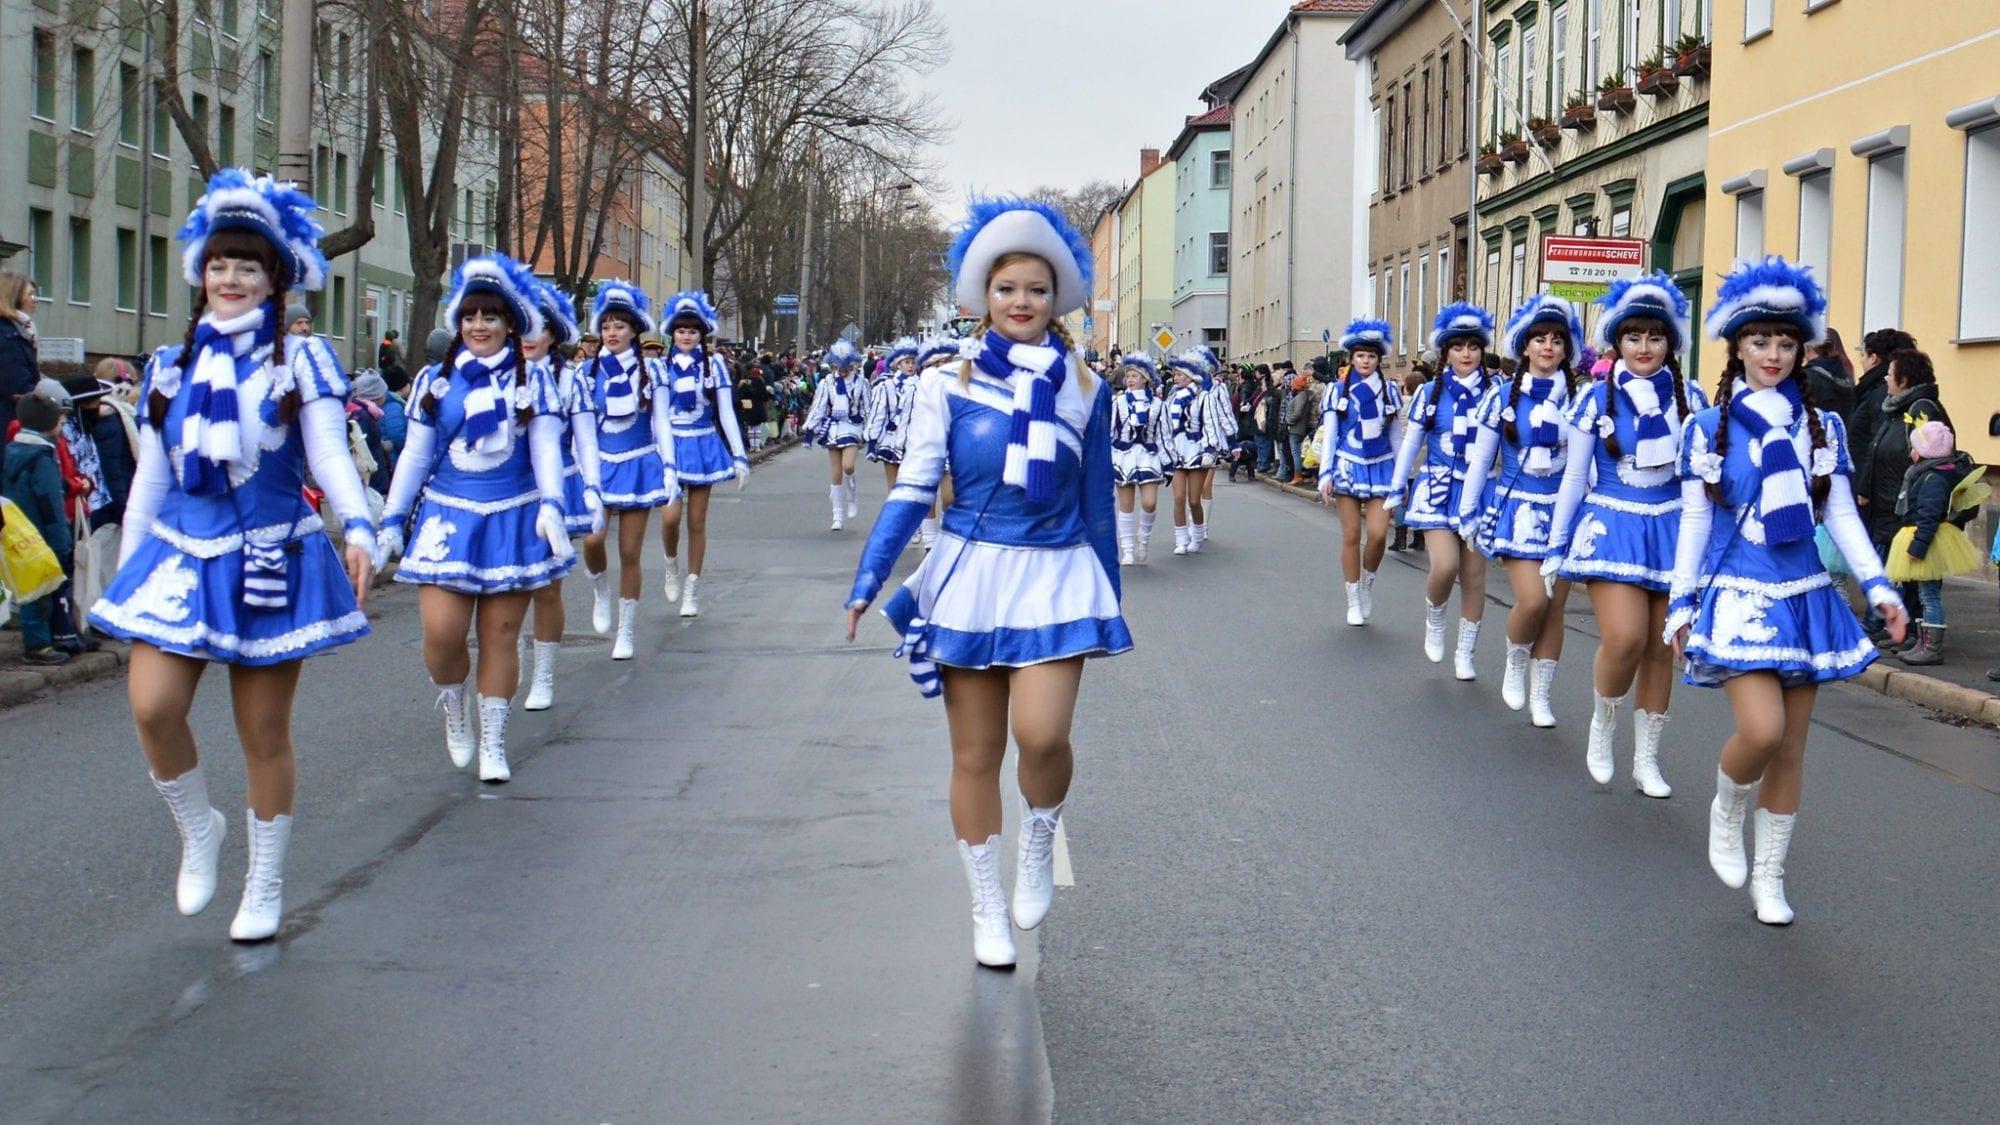 Tanzmariechen- Those Fabulous Karneval Dancers!